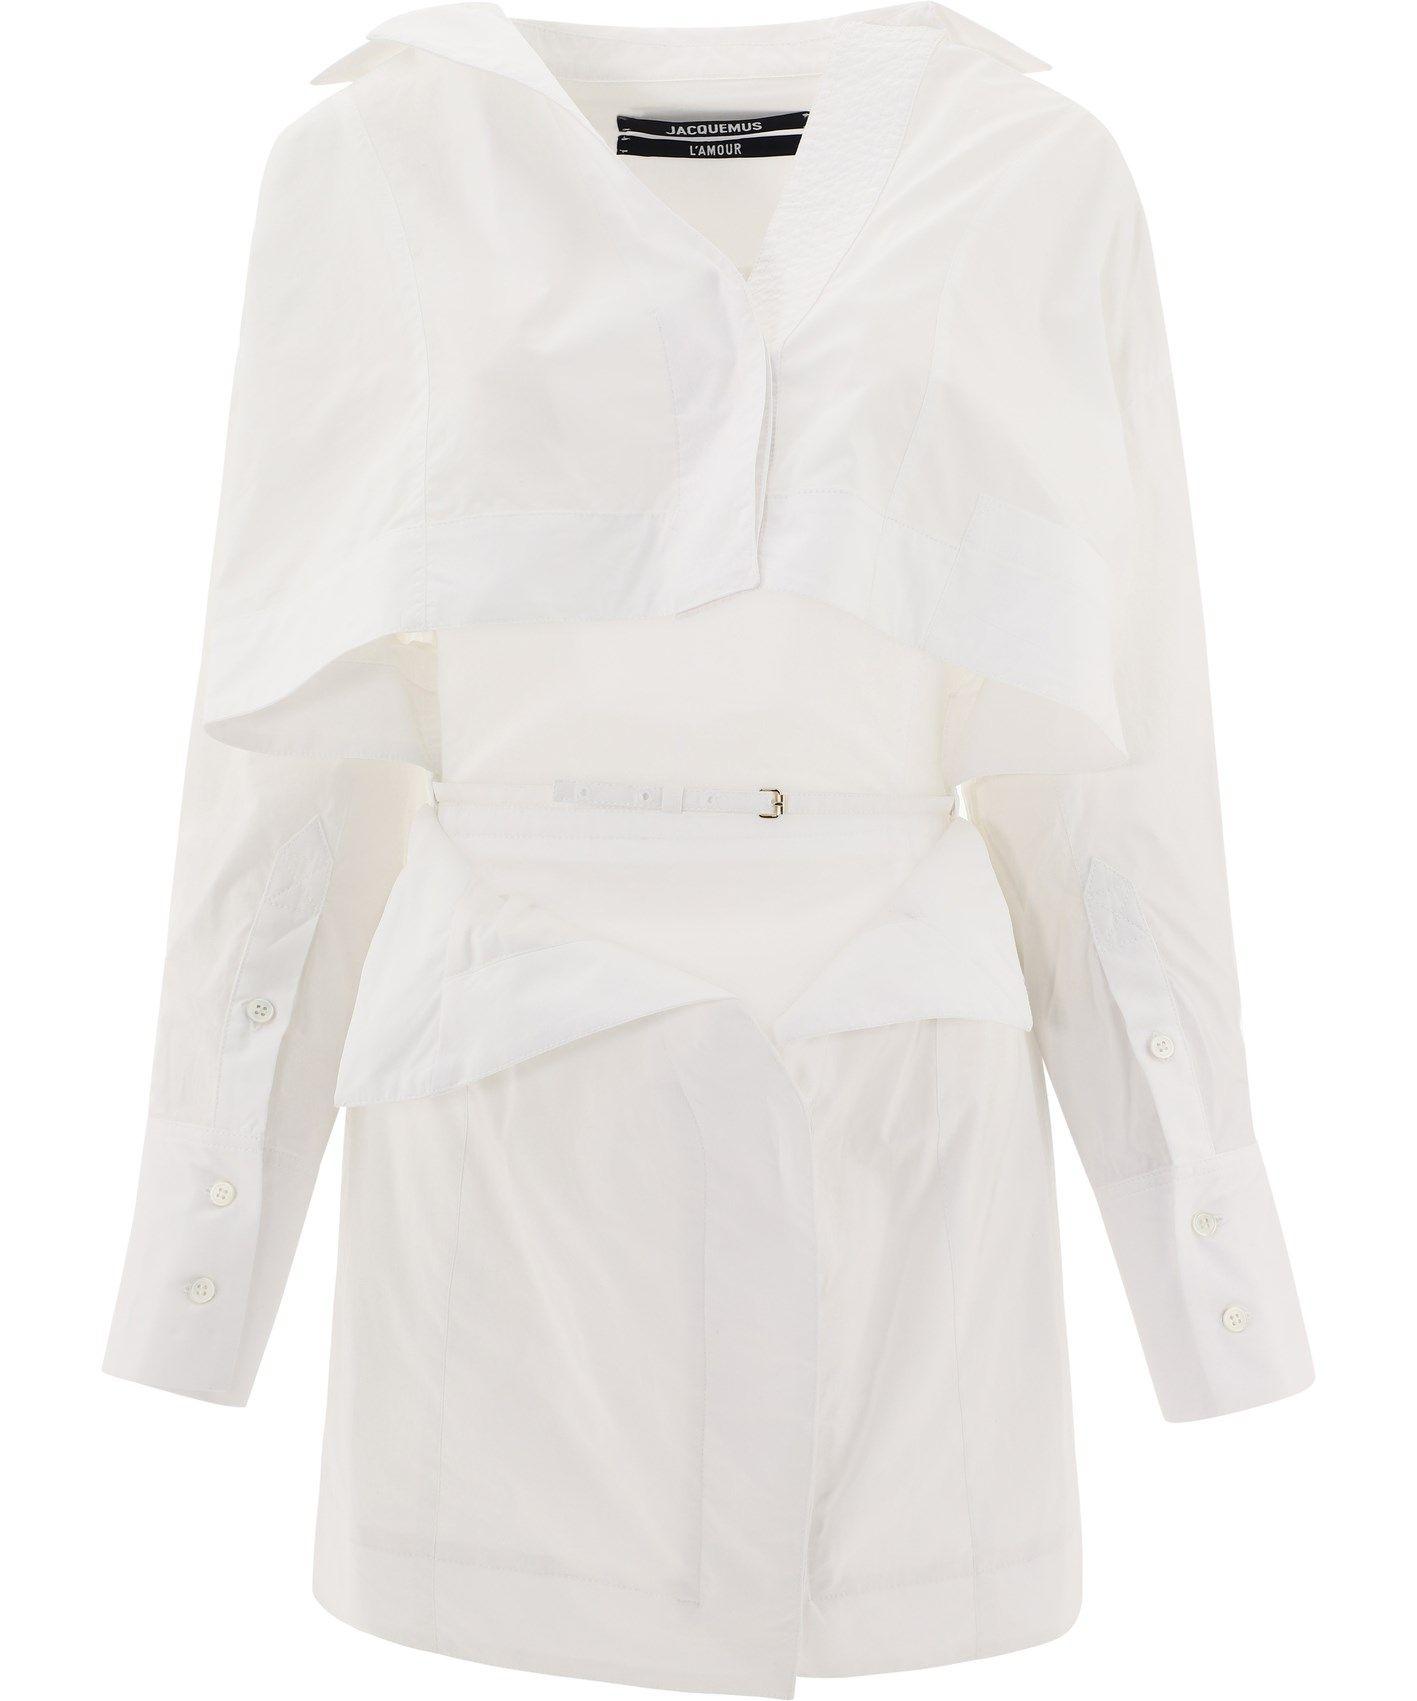 Jacquemus JACQUEMUS WOMEN'S WHITE OTHER MATERIALS DRESS